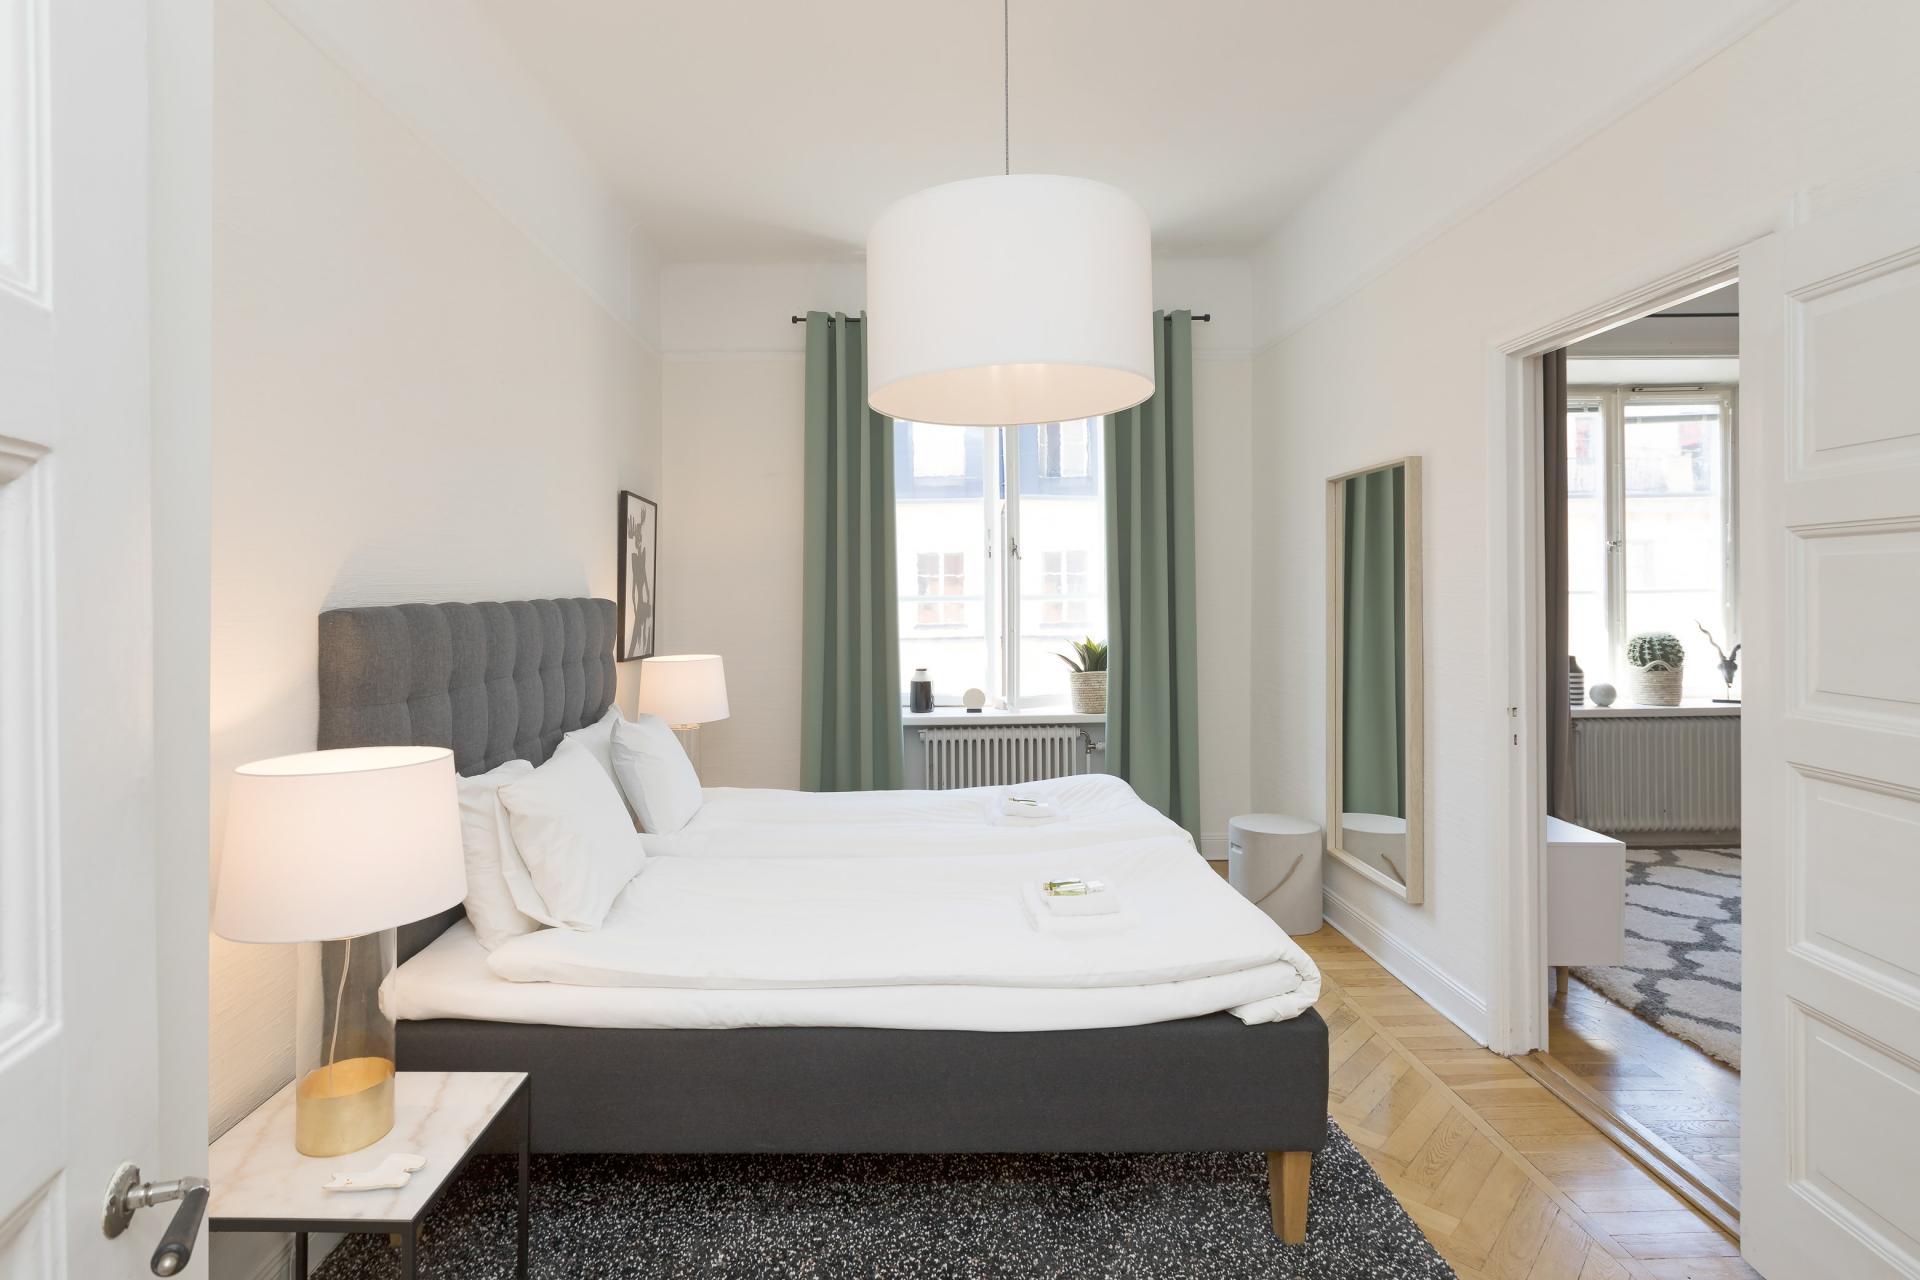 Bed at Pontonjärgatan Apartments, Marieberg, Stockholm - Citybase Apartments